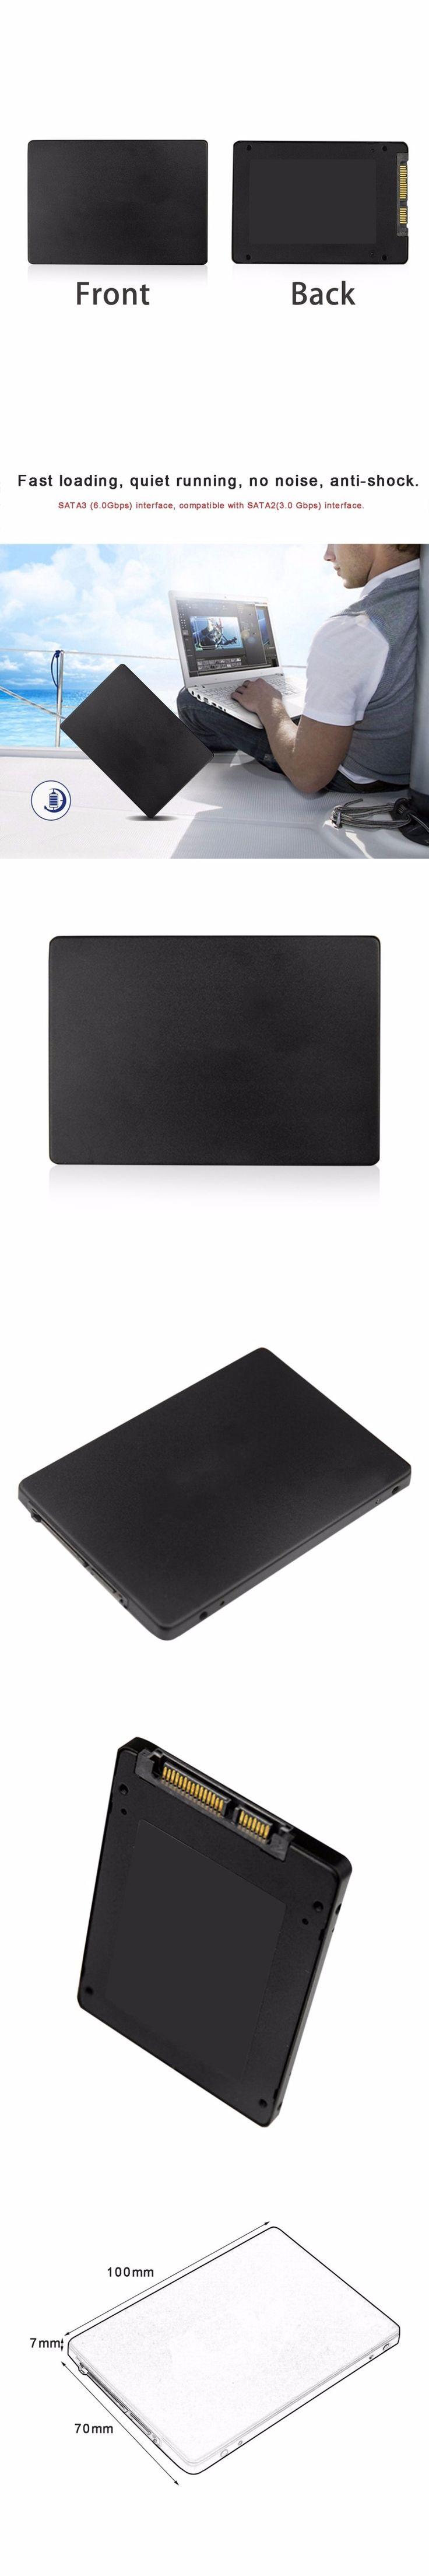 "2.5"" SSD SATA3.0 Hard Disk 120GB High Speed SSD Hard Drive Disk Disc Solid State Disks For Desktop Laptop Computer PC Hot Sale"